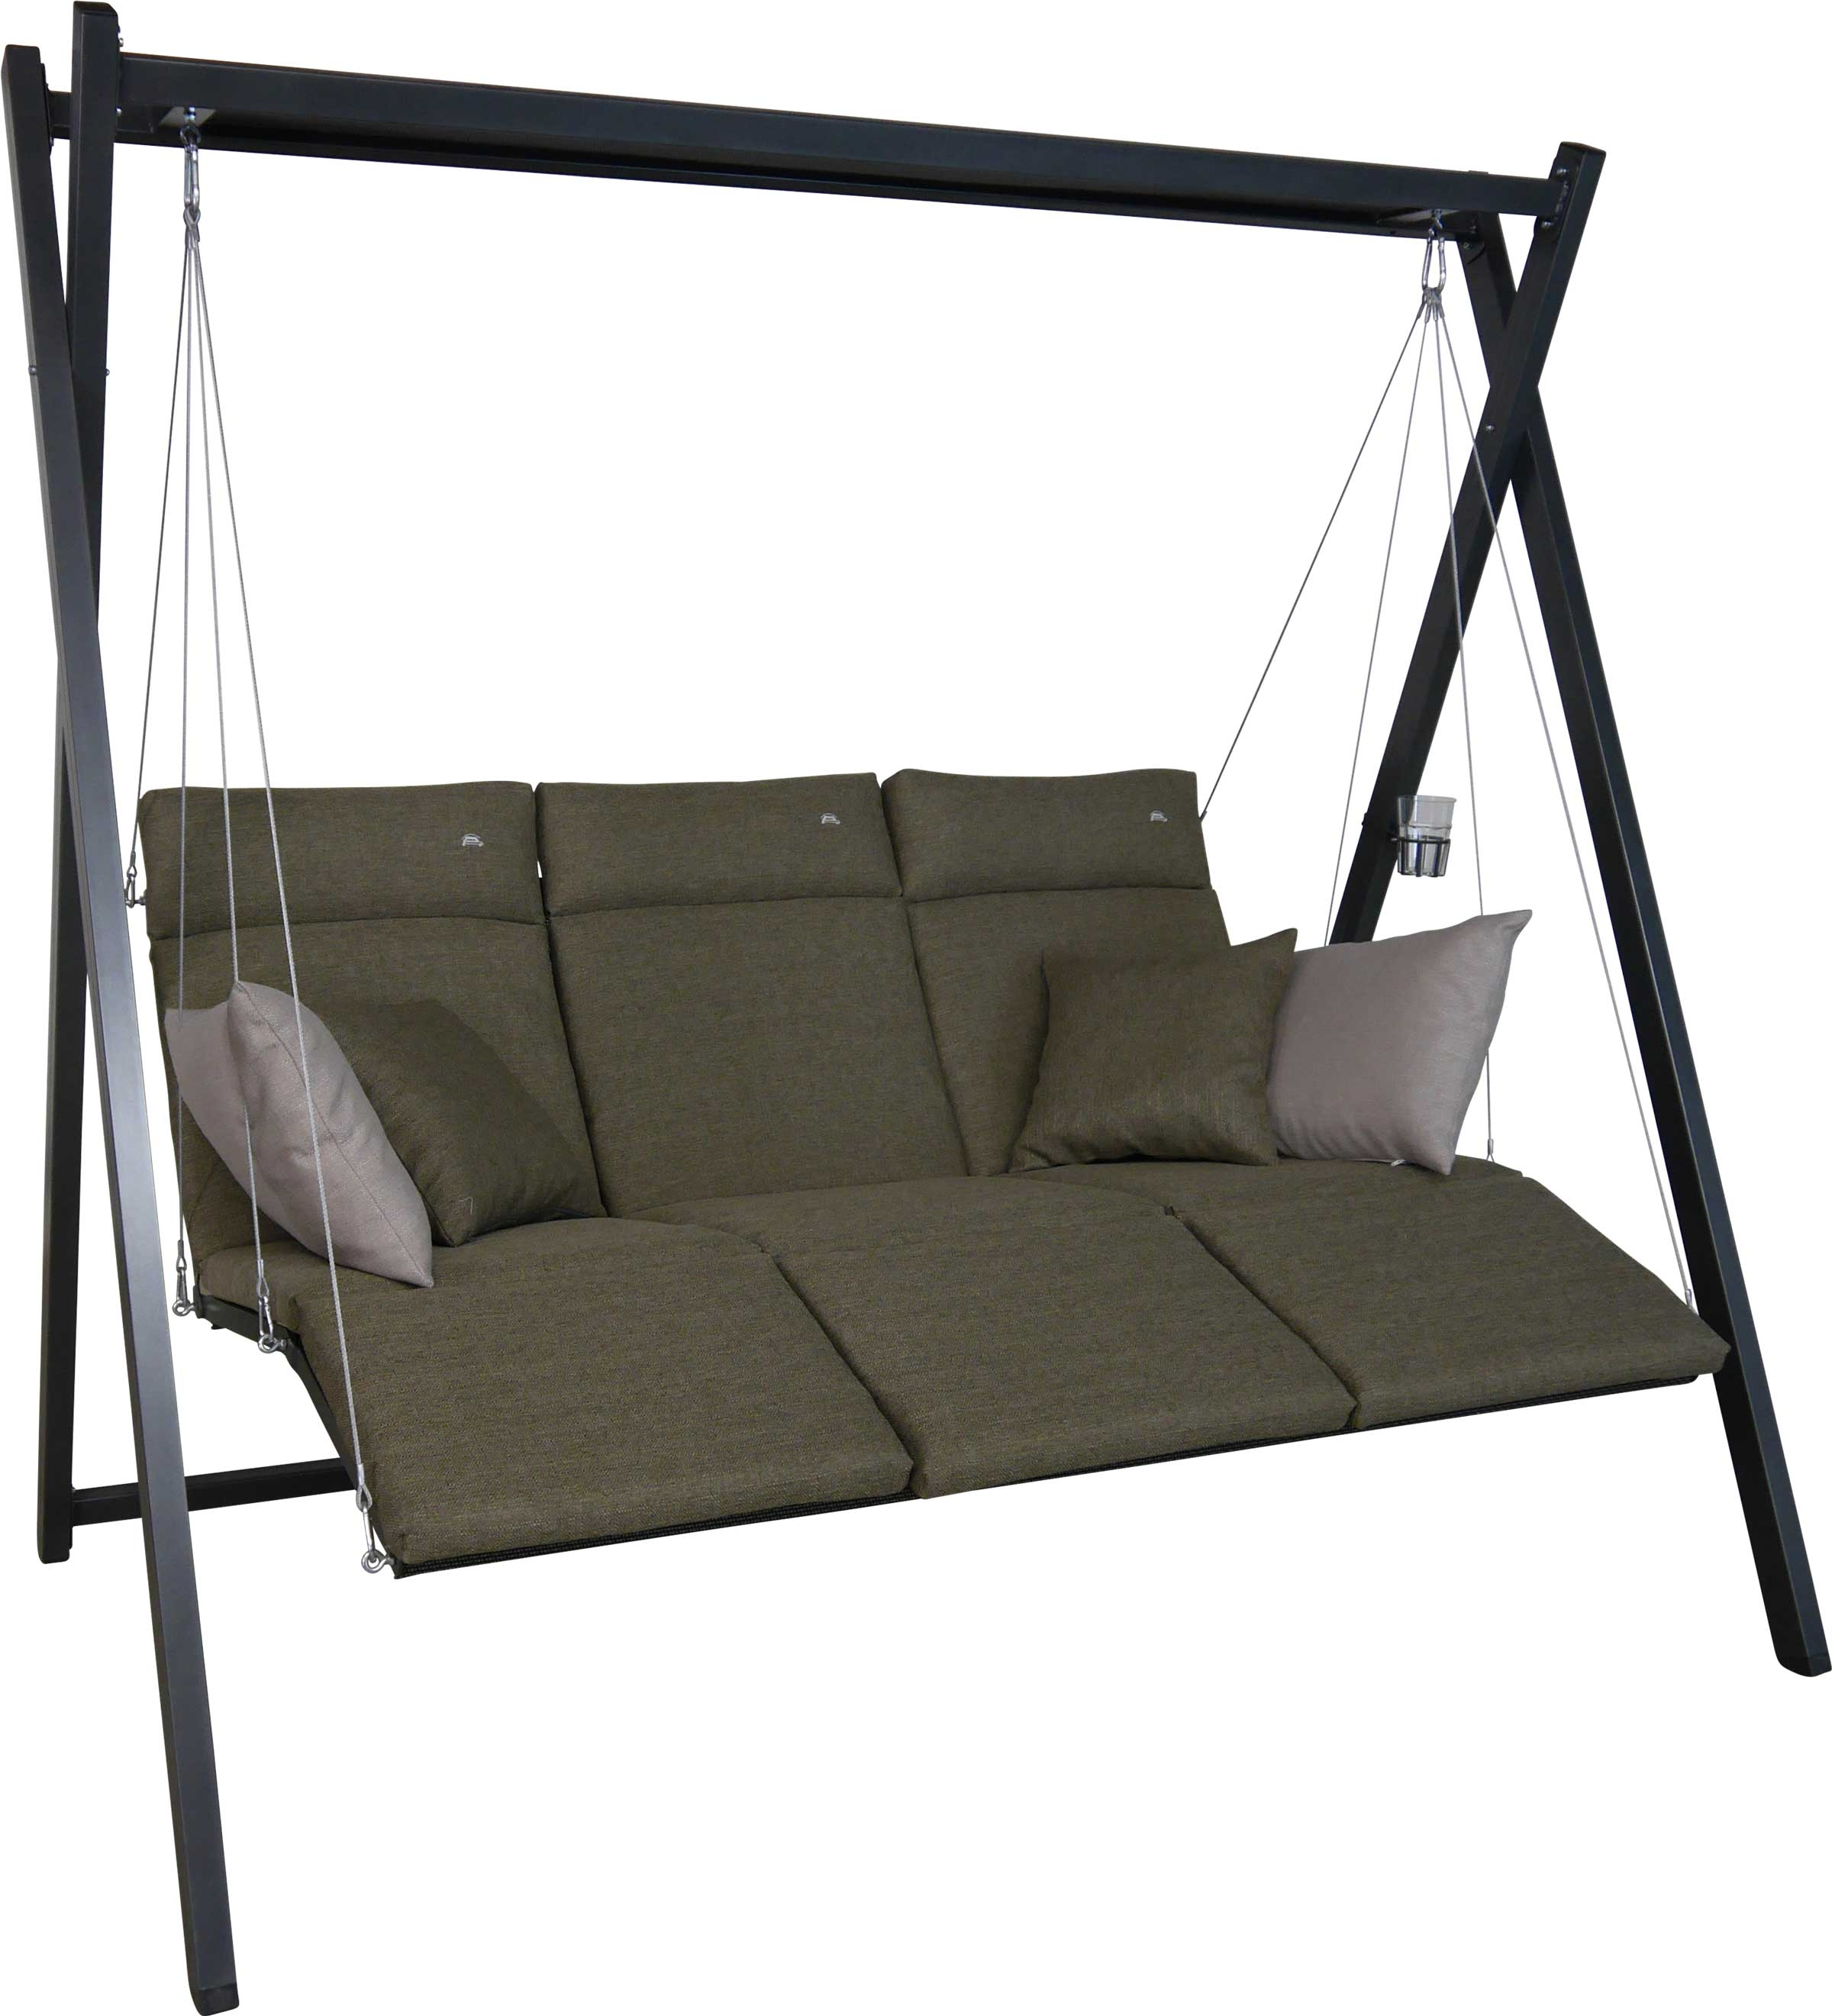 Angerer Hollywoodschaukel Relax Smart olive - 3-Sitzer